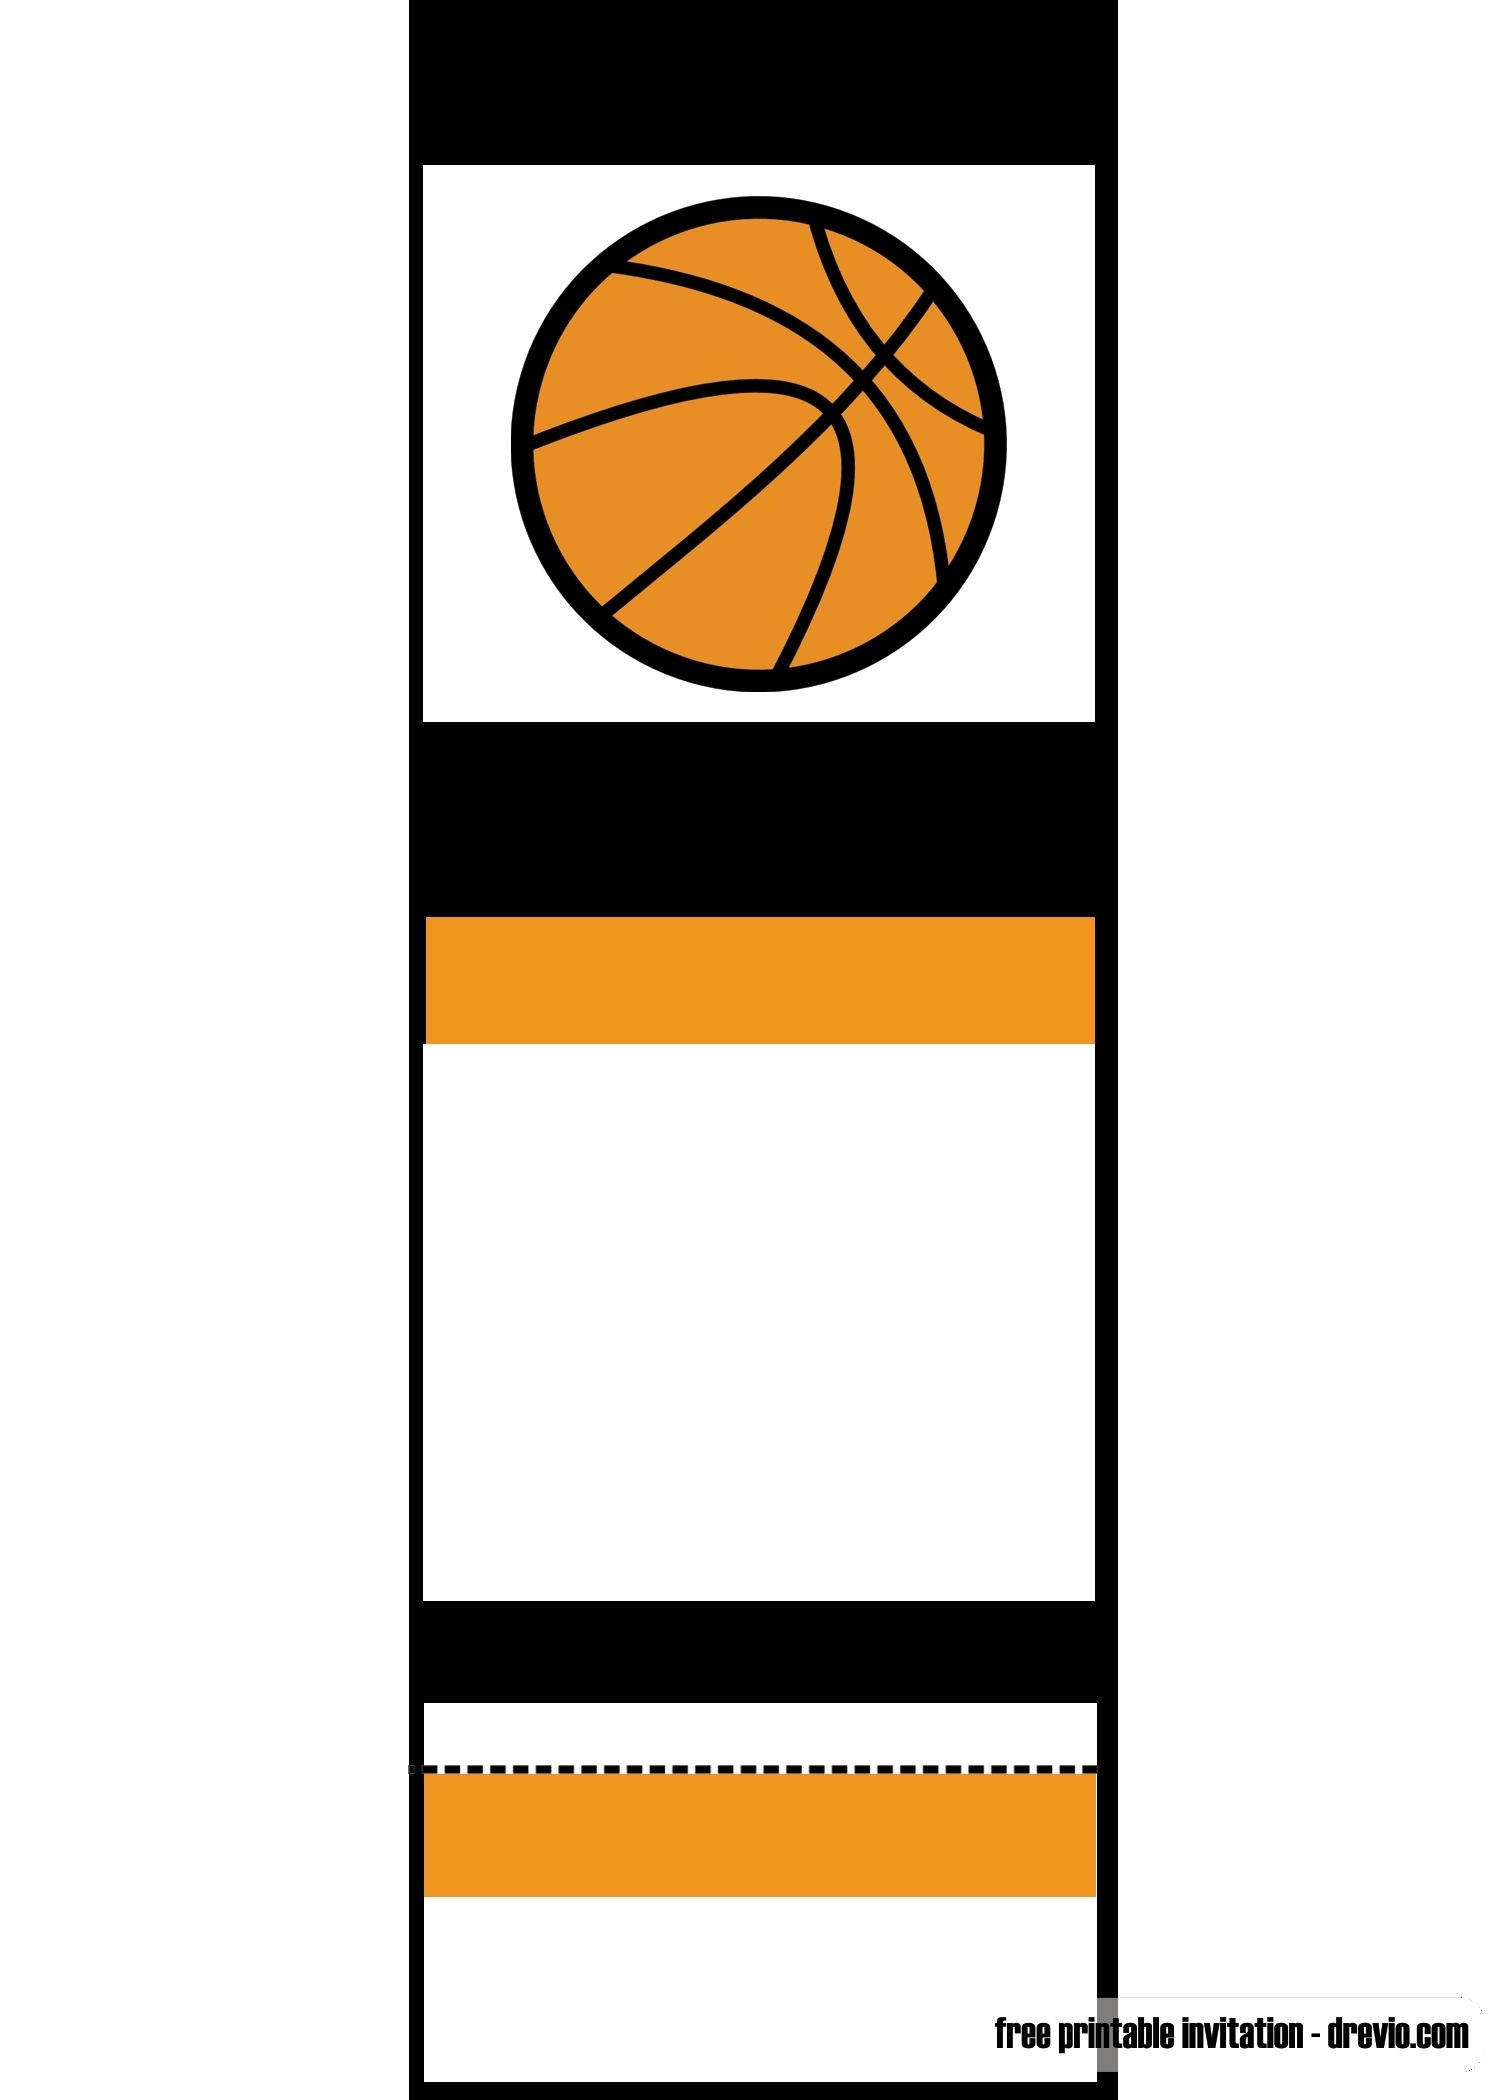 Free Printable Basketball Ticket Invitation | Unc Vs Gonzaga - Free Printable Sports Birthday Invitation Templates